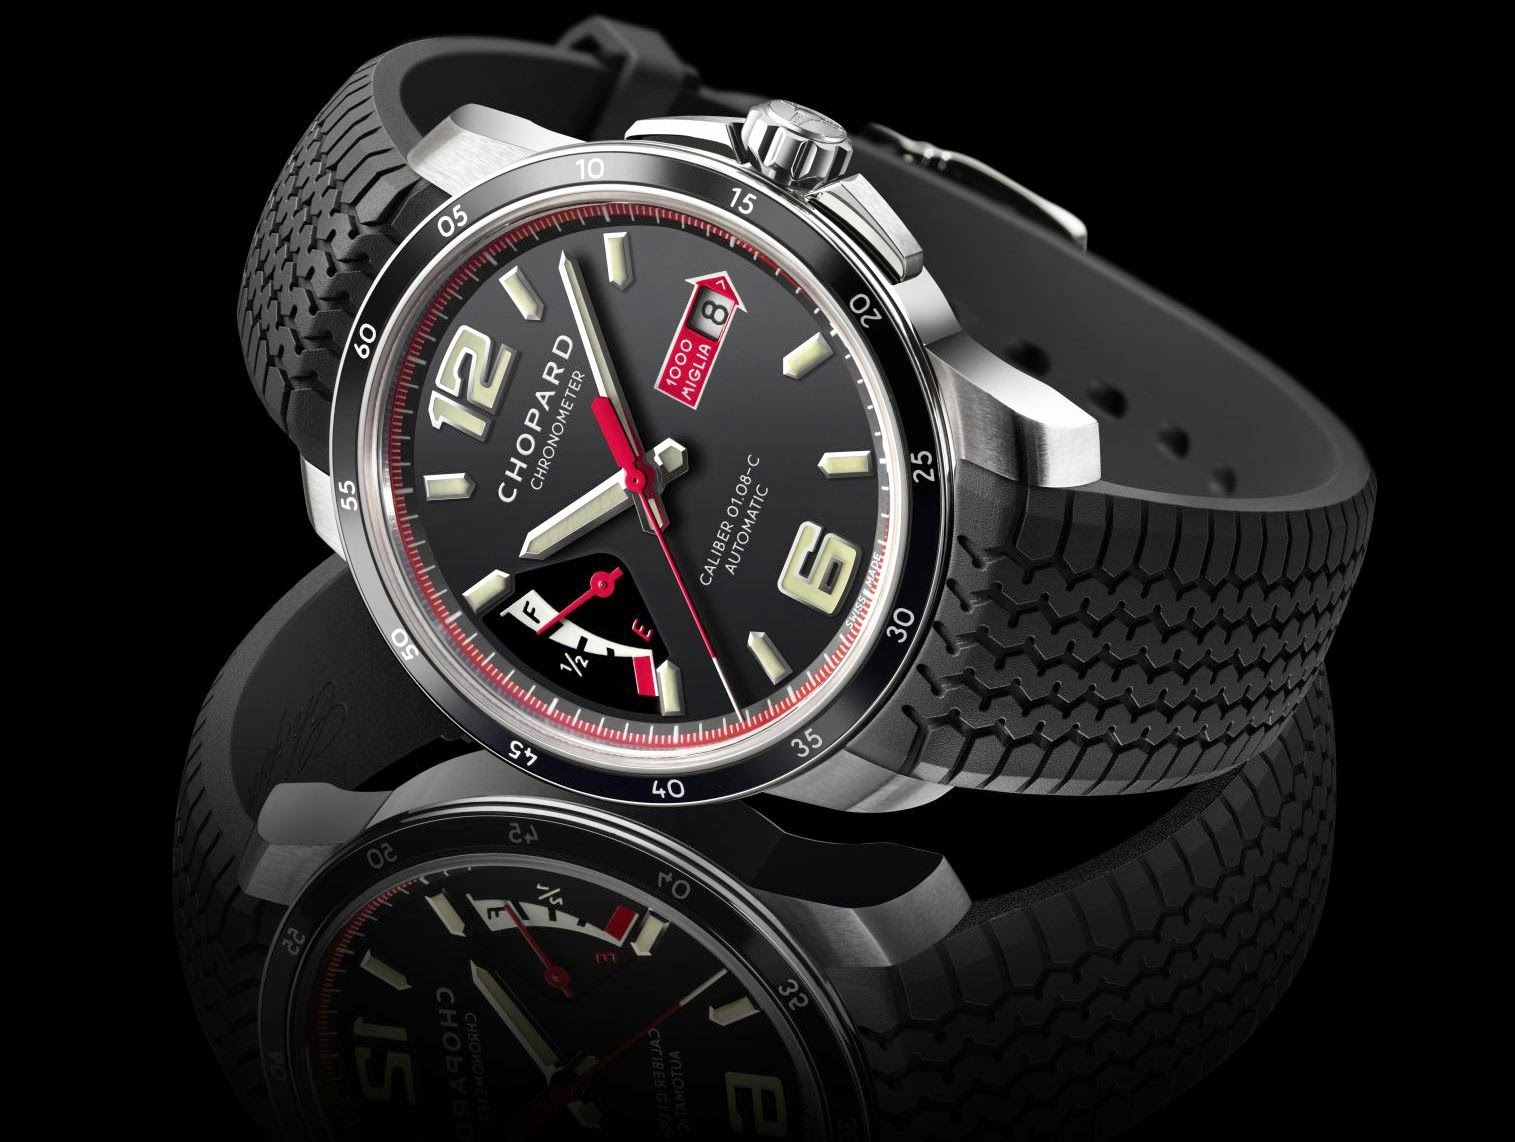 News : Chopard Mille Miglia GTS Power Control Chopard%2BMille%2BMiglia%2BGTS%2BPower%2BControl%2B2